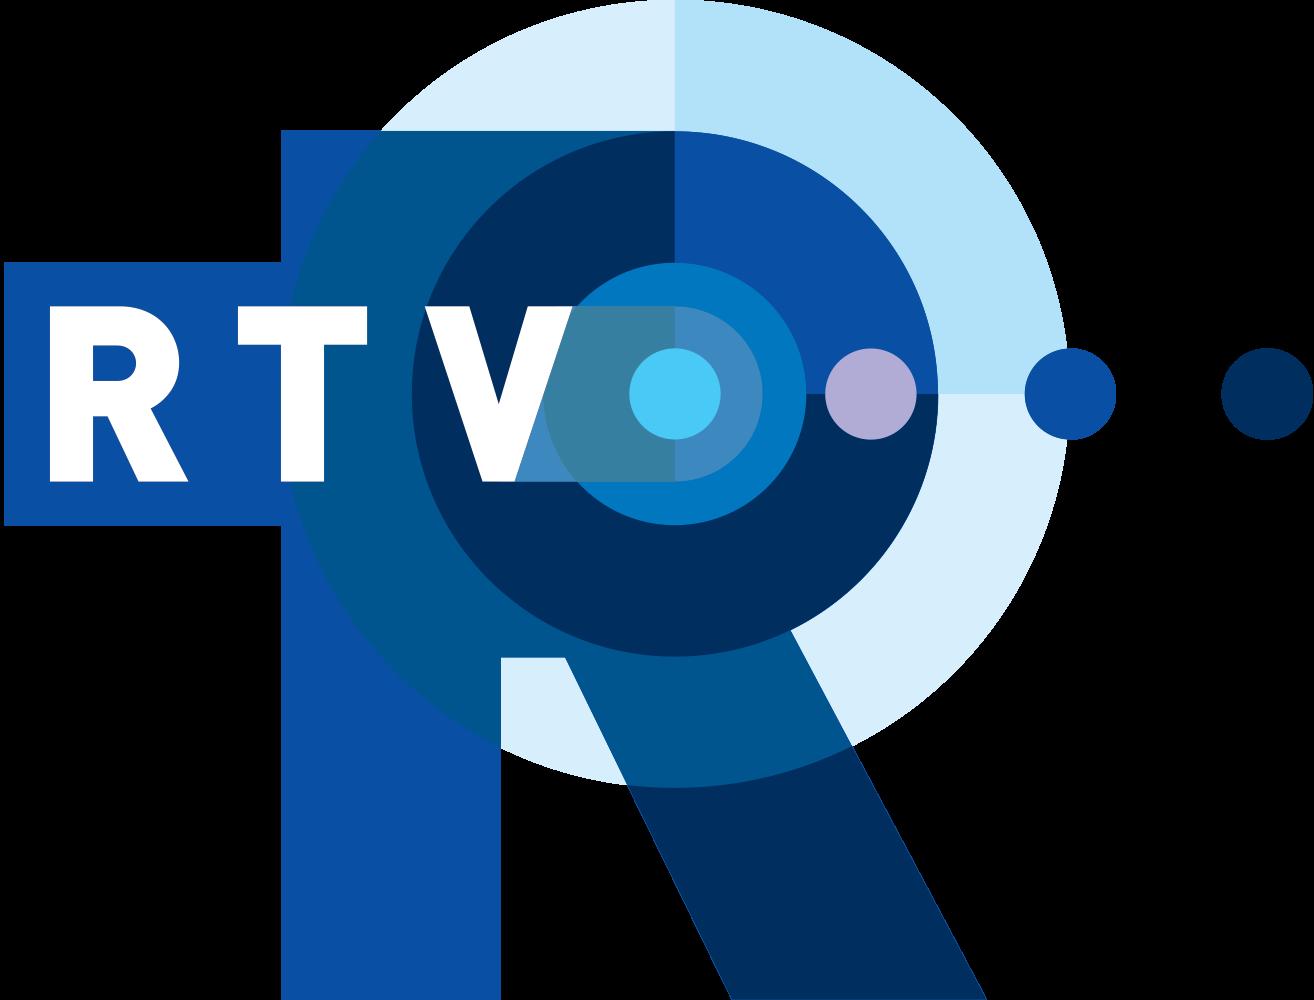 rtvr-logo.png